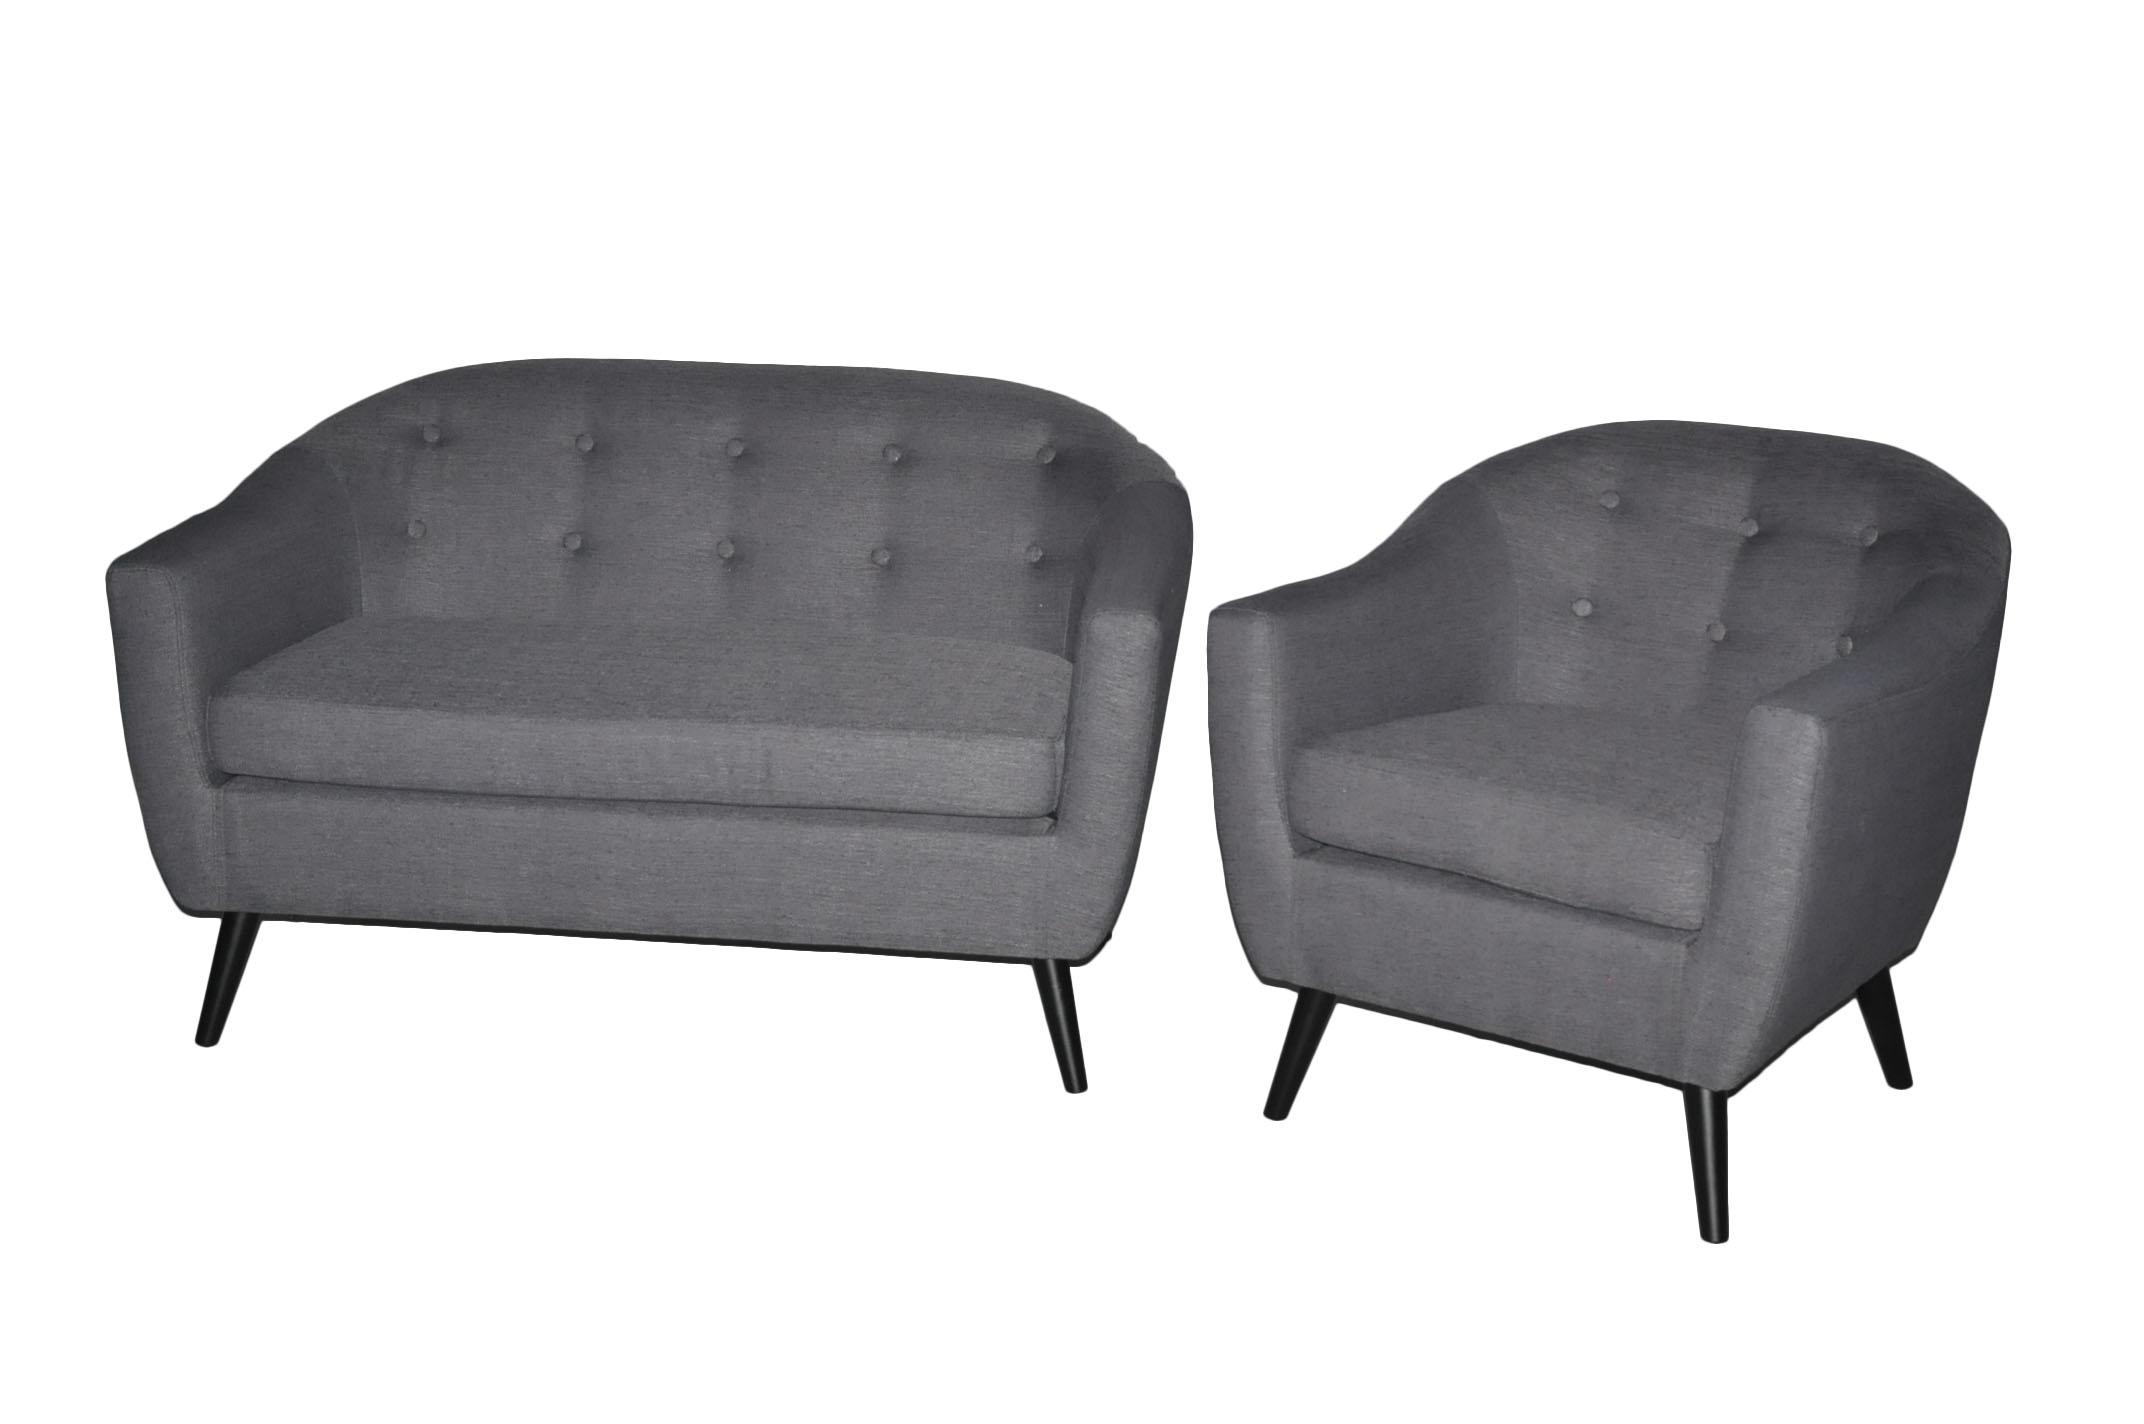 petite banquette style scandinave retro tissu gris bjort demeure et jardin. Black Bedroom Furniture Sets. Home Design Ideas